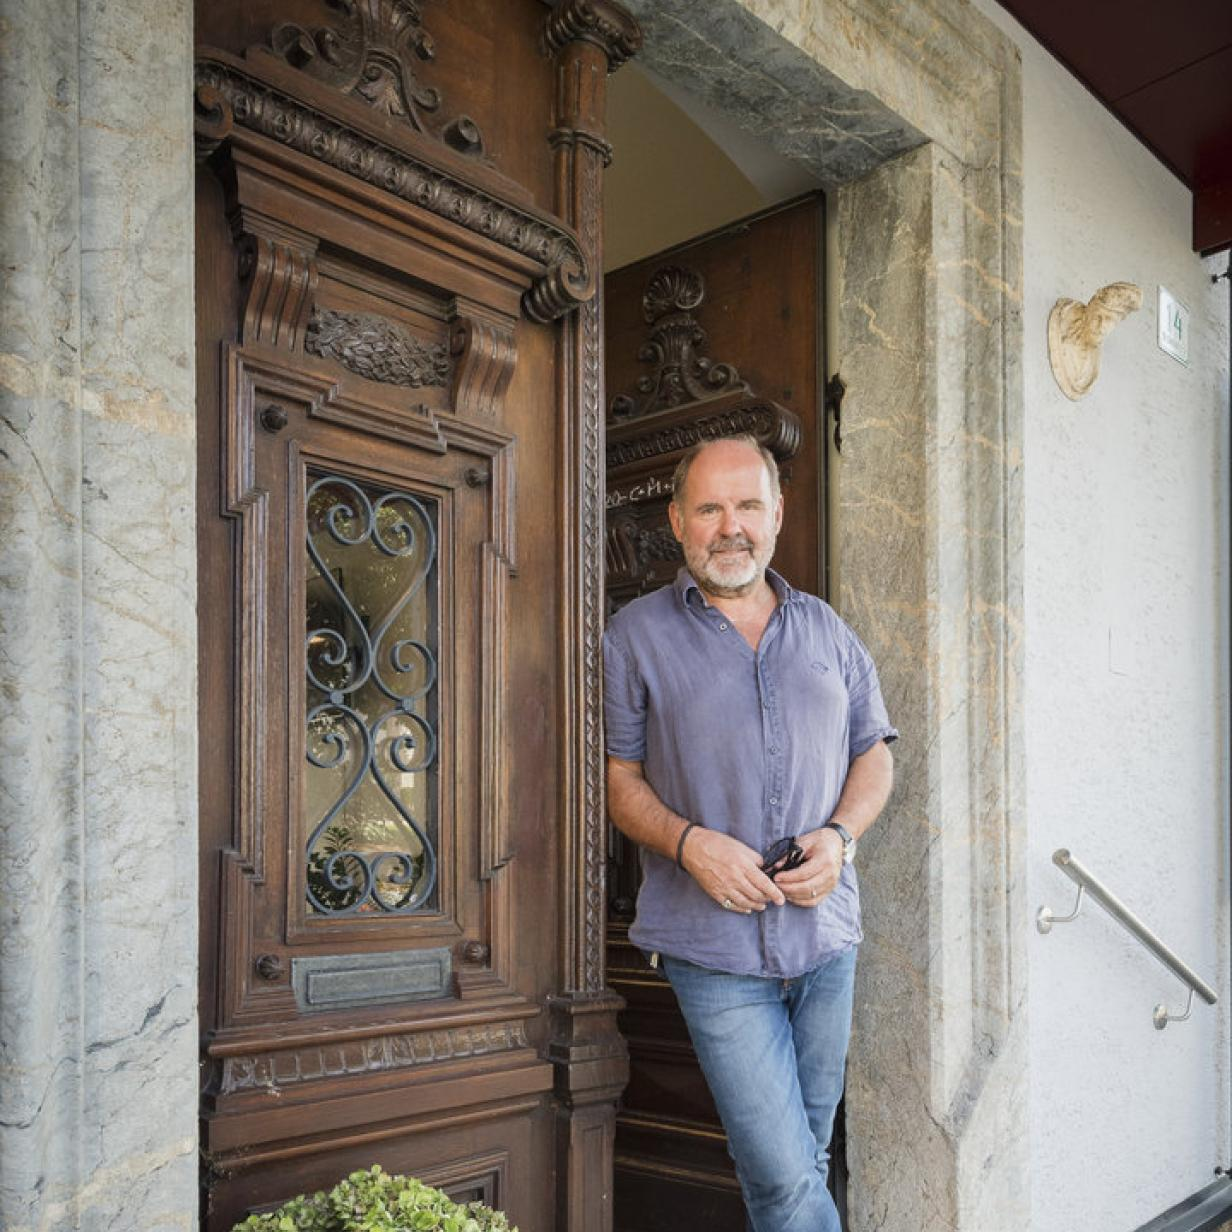 Partnersuche Ab 60 Sankt Stefan Ob Stainz Singleborse Aus